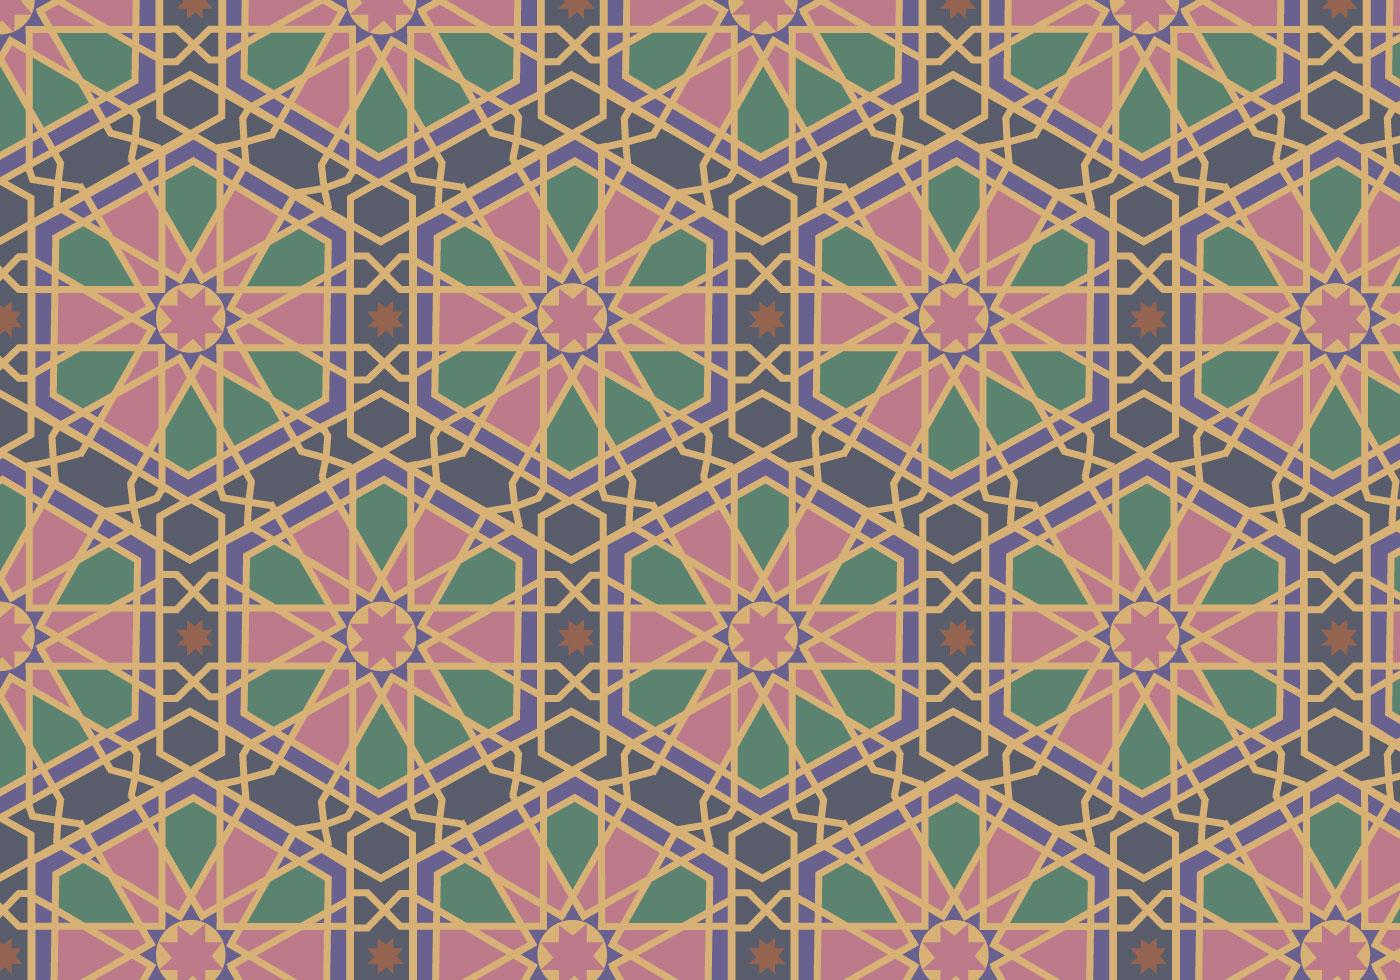 Mosaic Pattern Vector Download Free Vector Art Stock